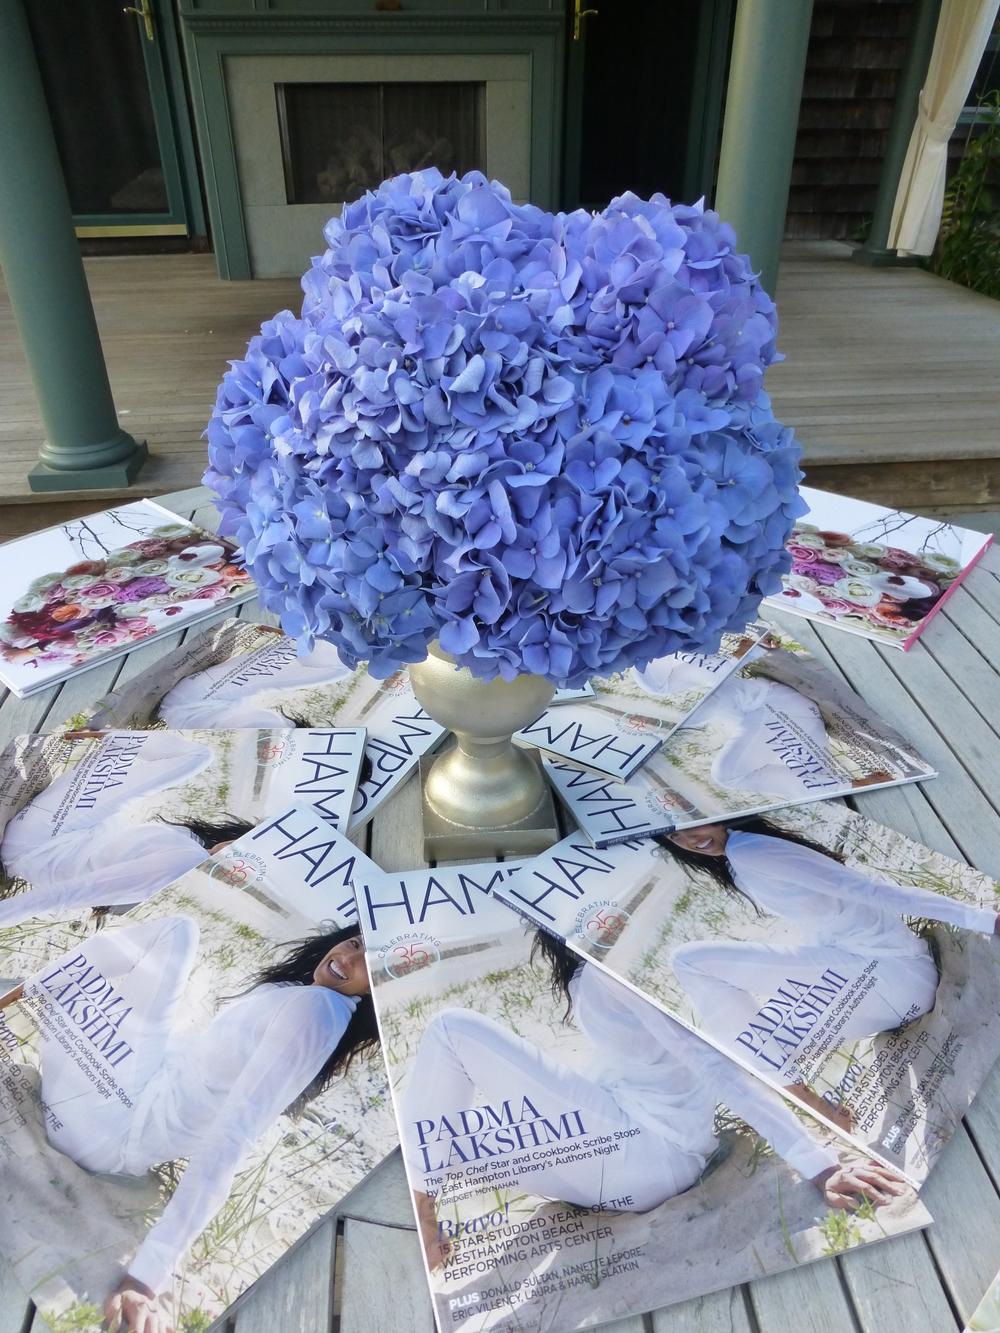 Hamptons Magazine Event from 2013: